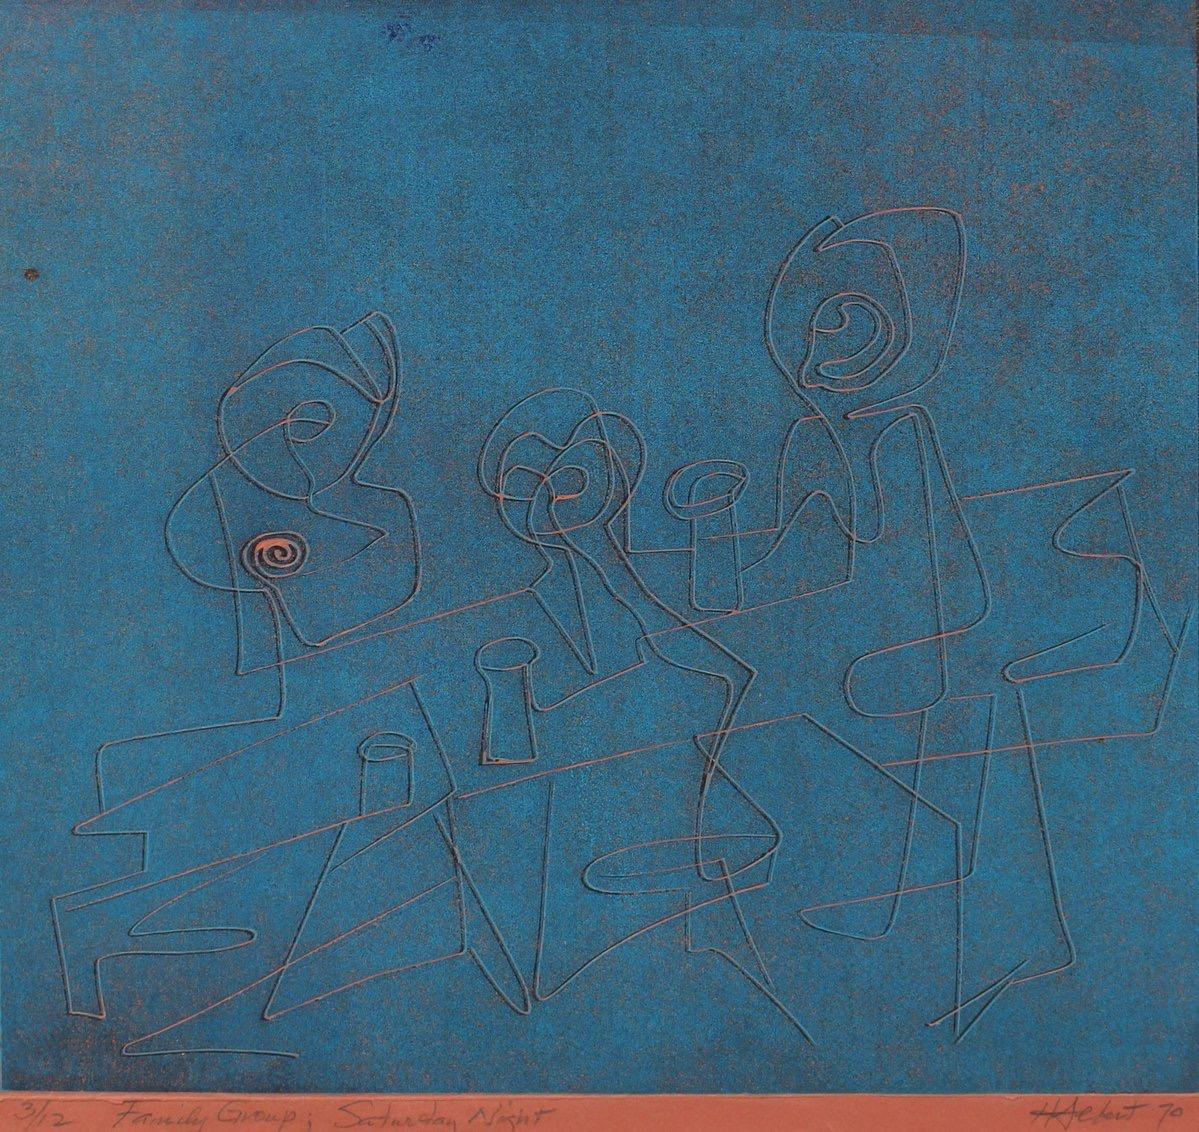 """Family Group; Saturday Night"" 1970 Serigraph"